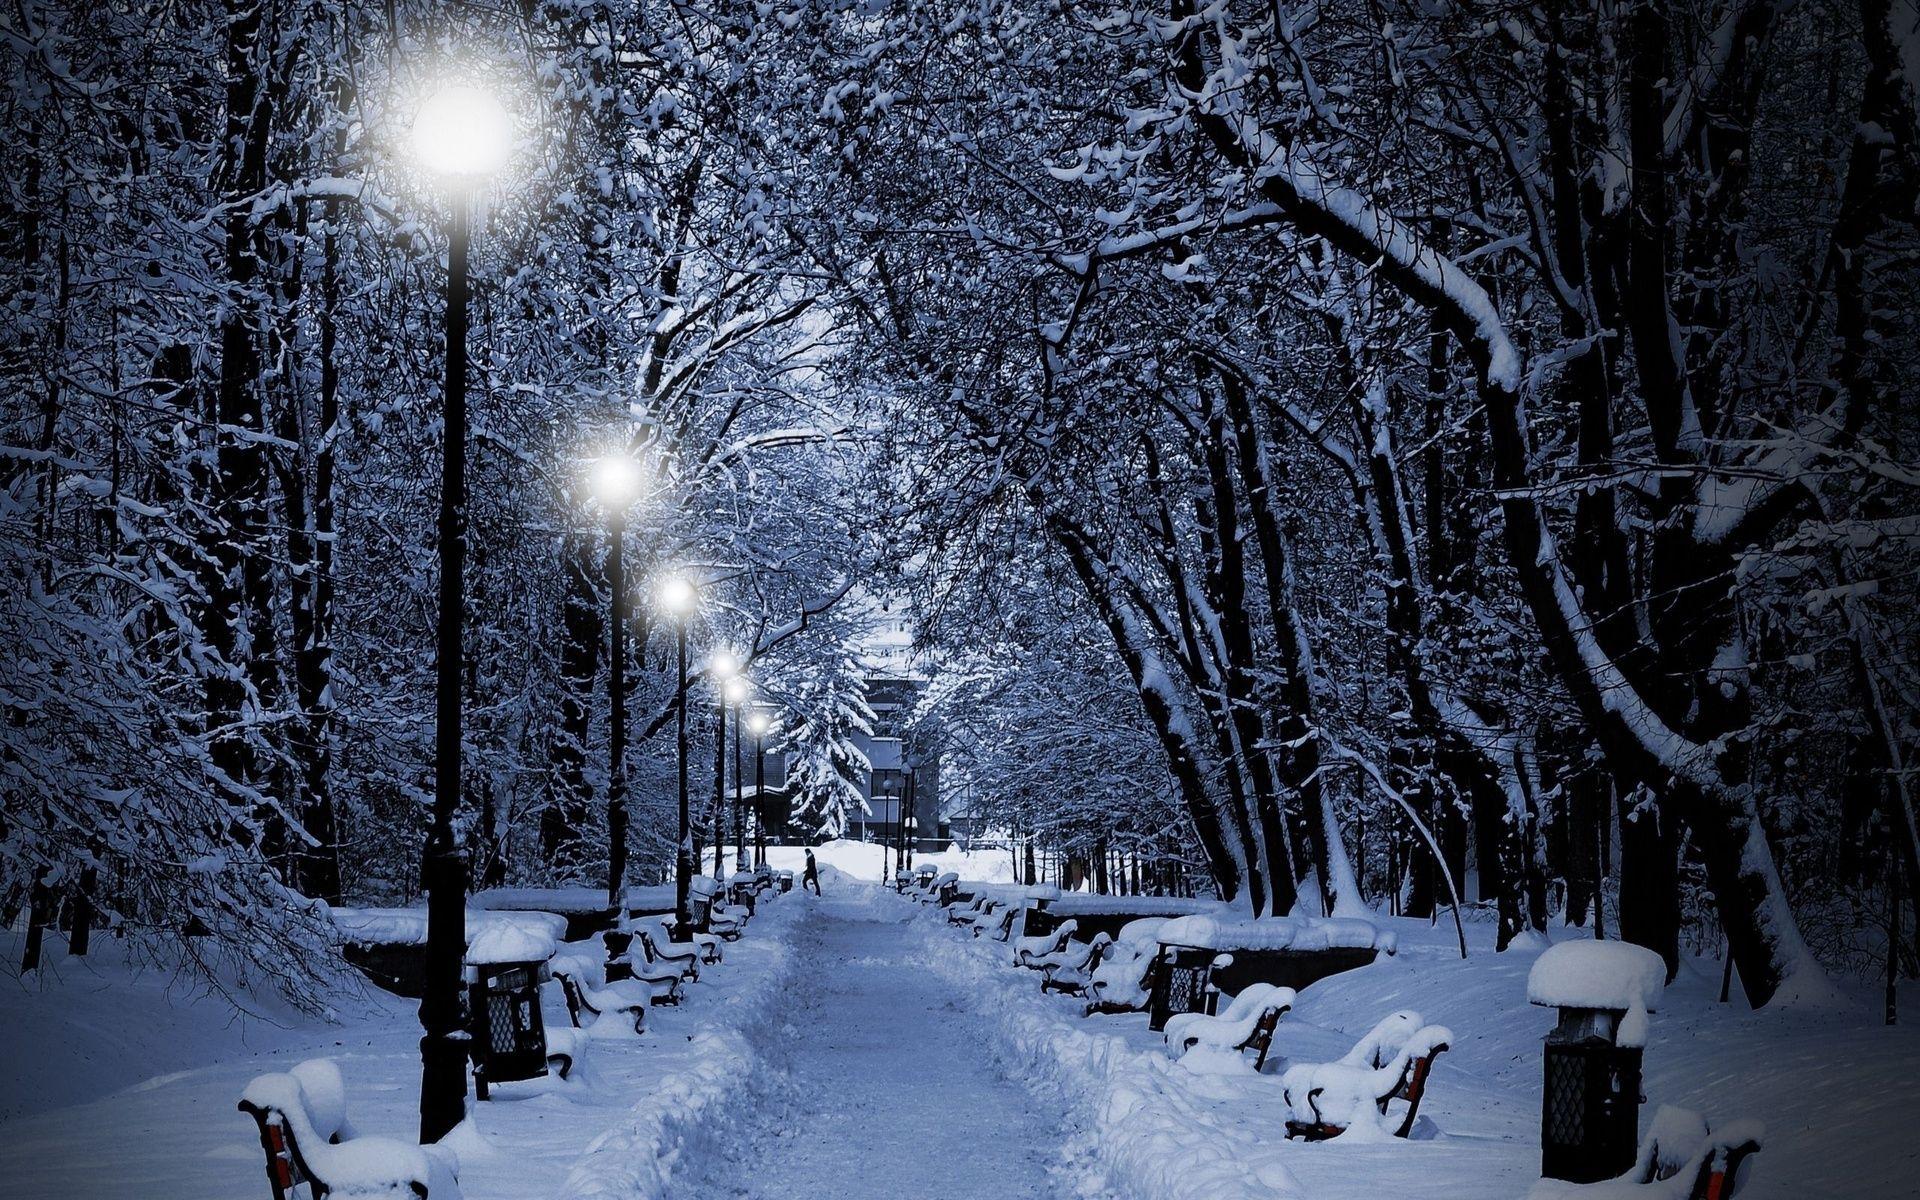 Night Winter Scenes Wallpaper Nature Winter Snow Snowflakes Snowing Trees Park White Night Winter Landscape Wallpaper Iphone Christmas Winter Wallpaper